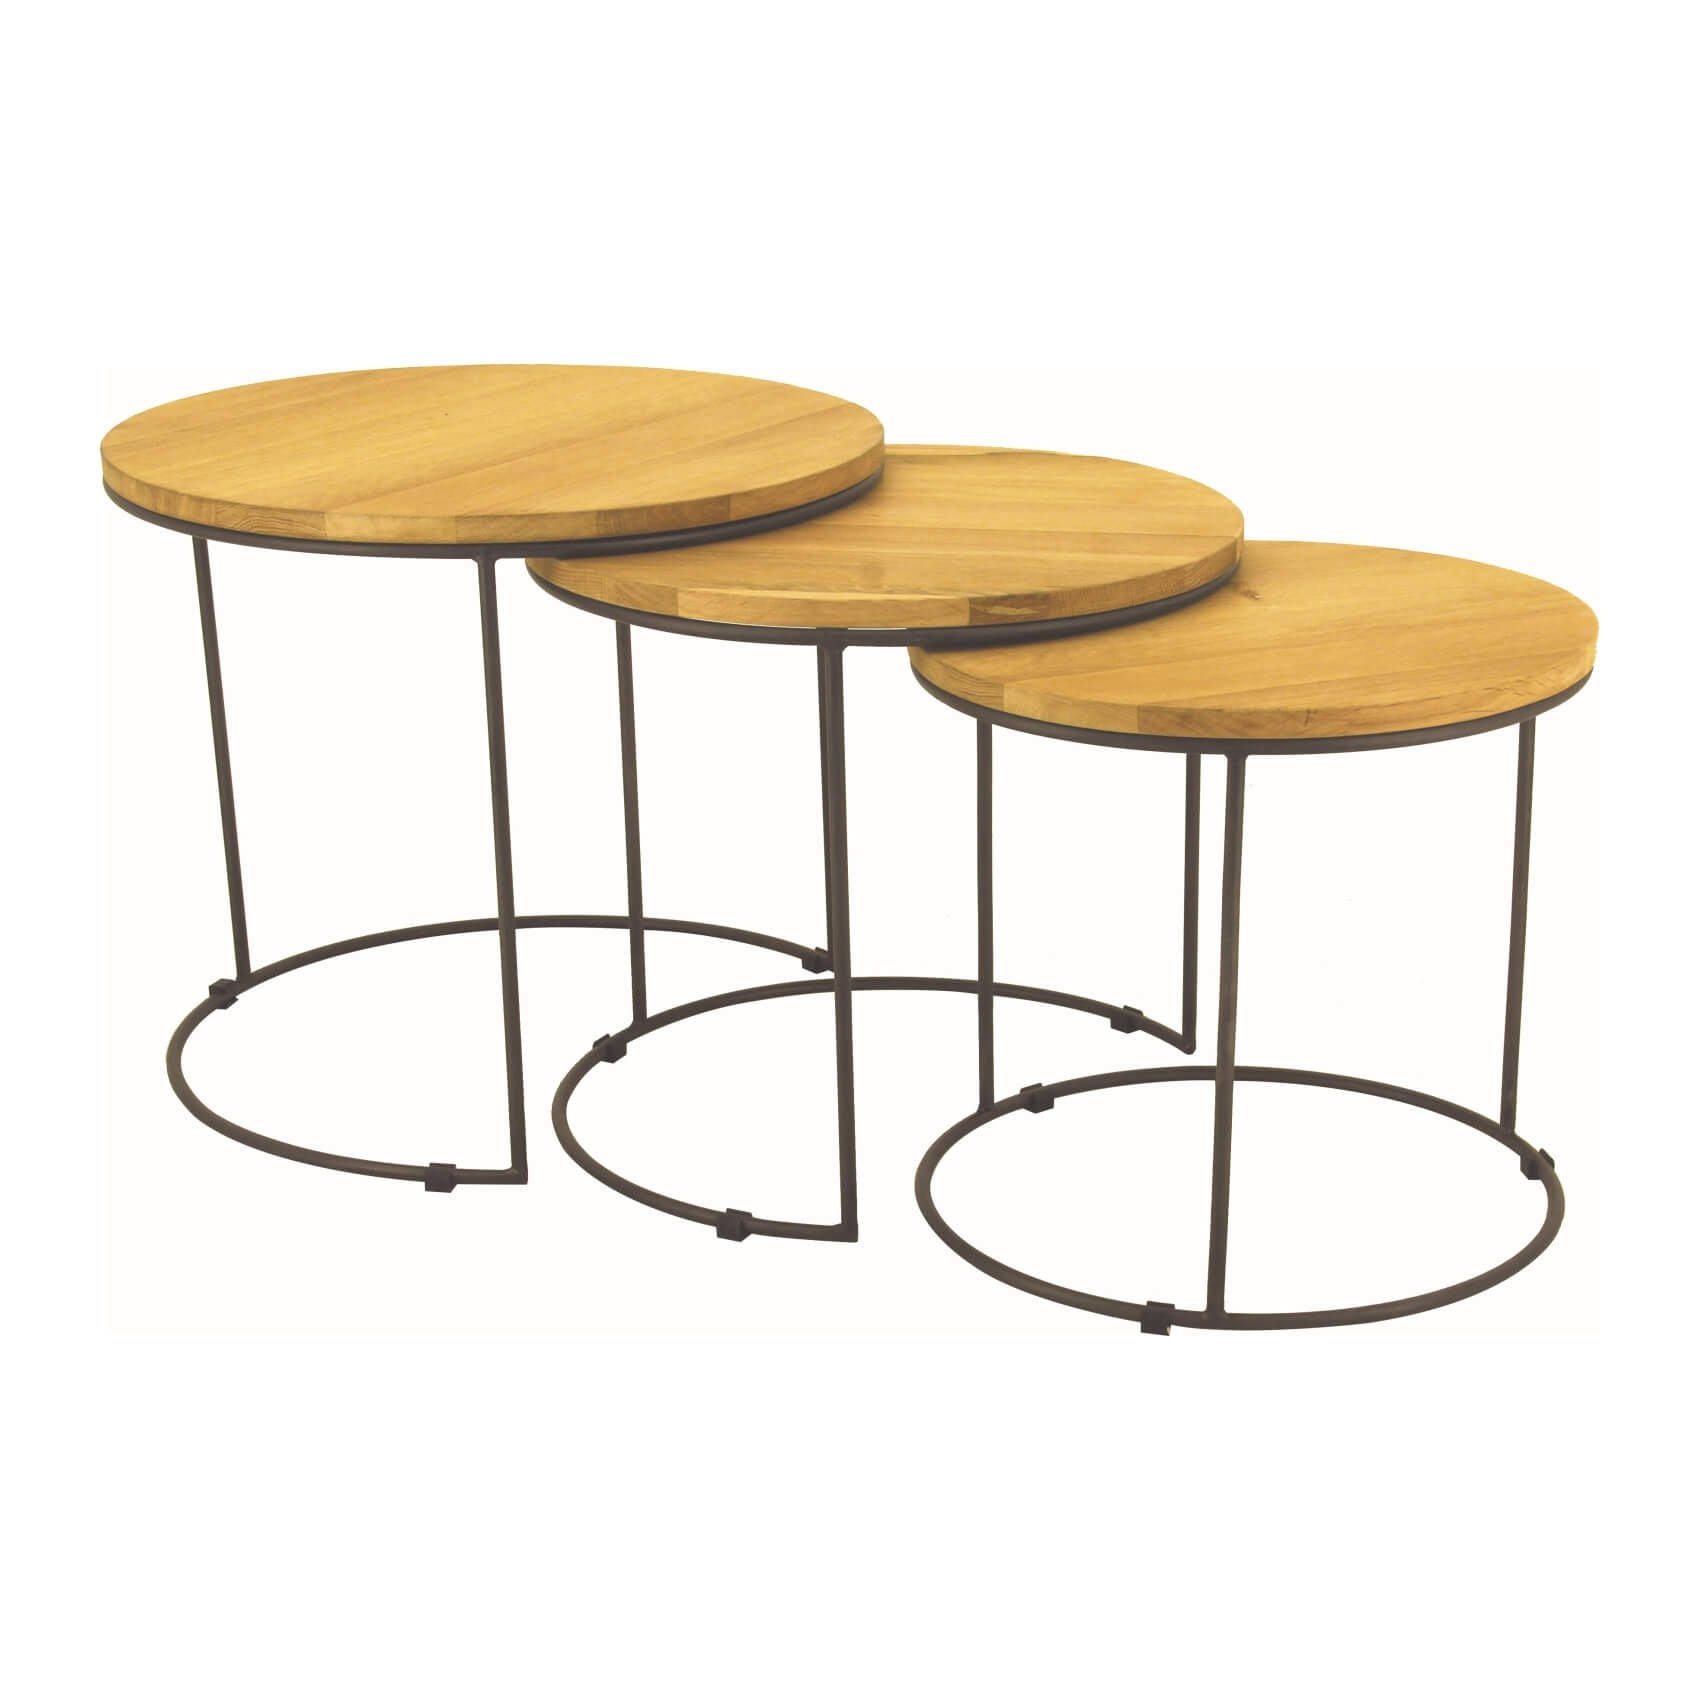 Eligio - Nested Coffee Table (Set Of 3) - Zillo + Hutch inside Set Of Nesting Coffee Tables (Image 11 of 30)